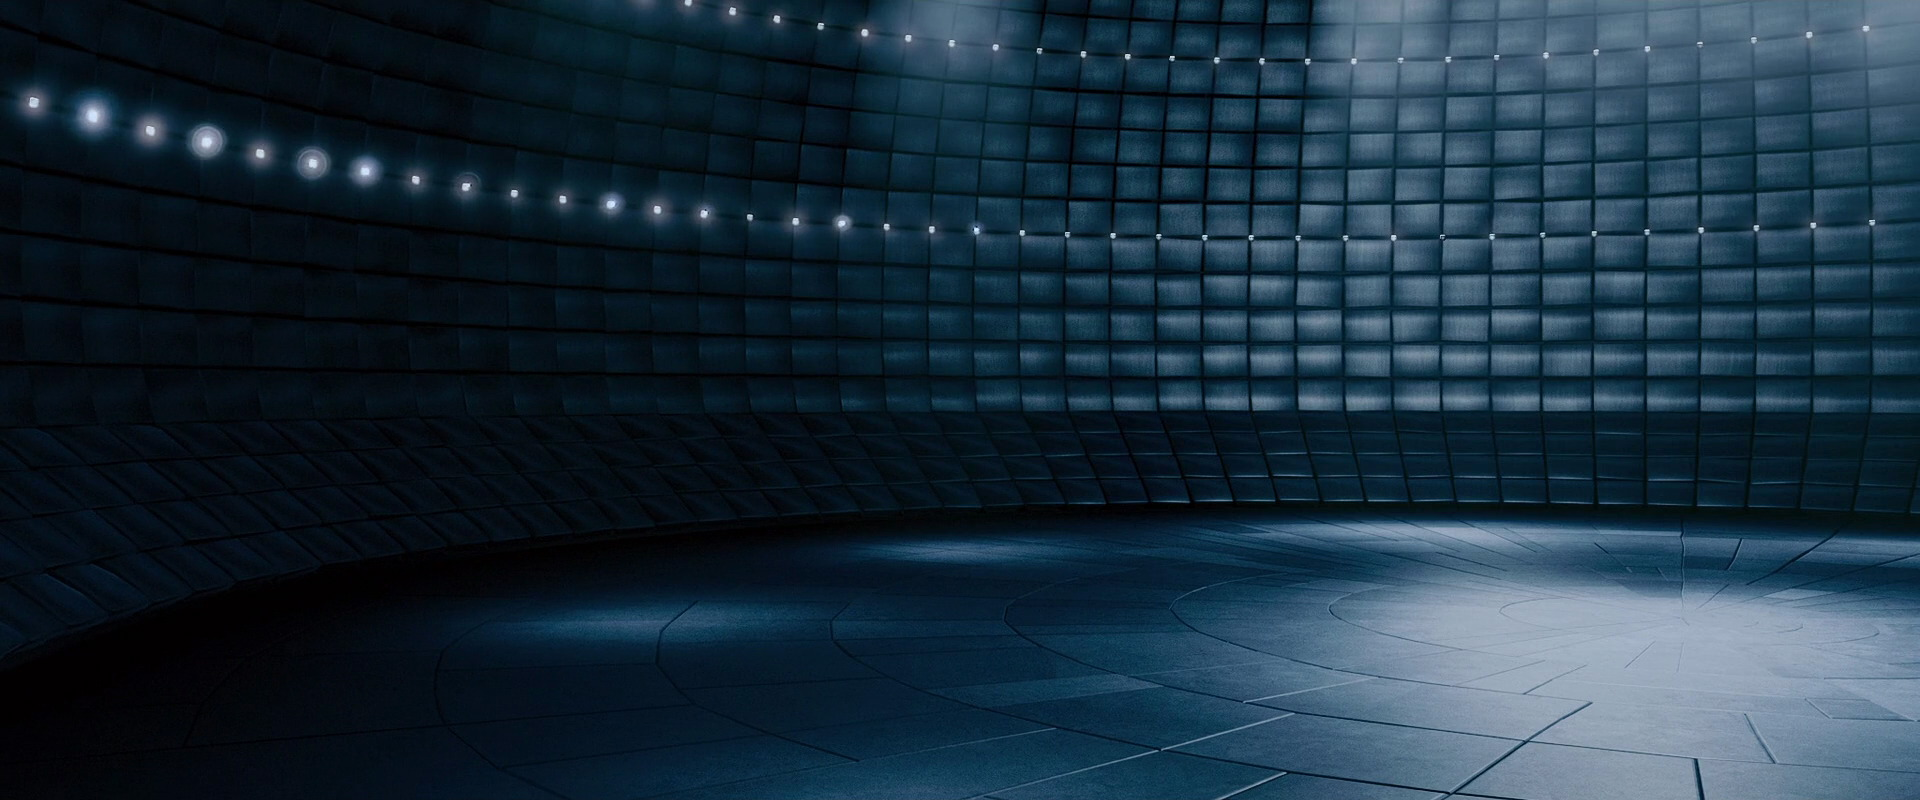 X Men Shadowcat Movie Danger Room - X-Men Mo...